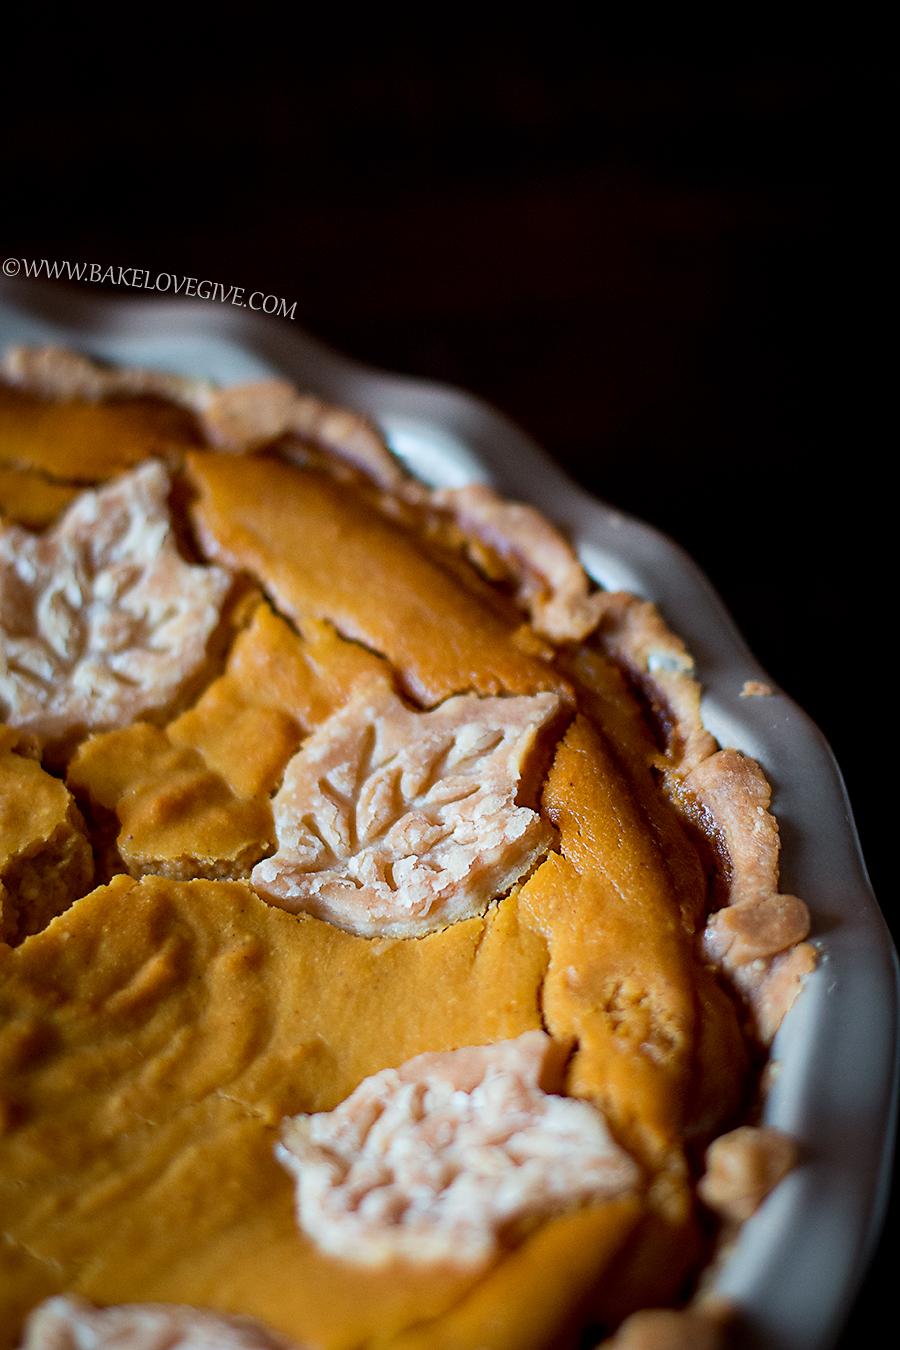 Fluffly Pumpkin Pie recipe